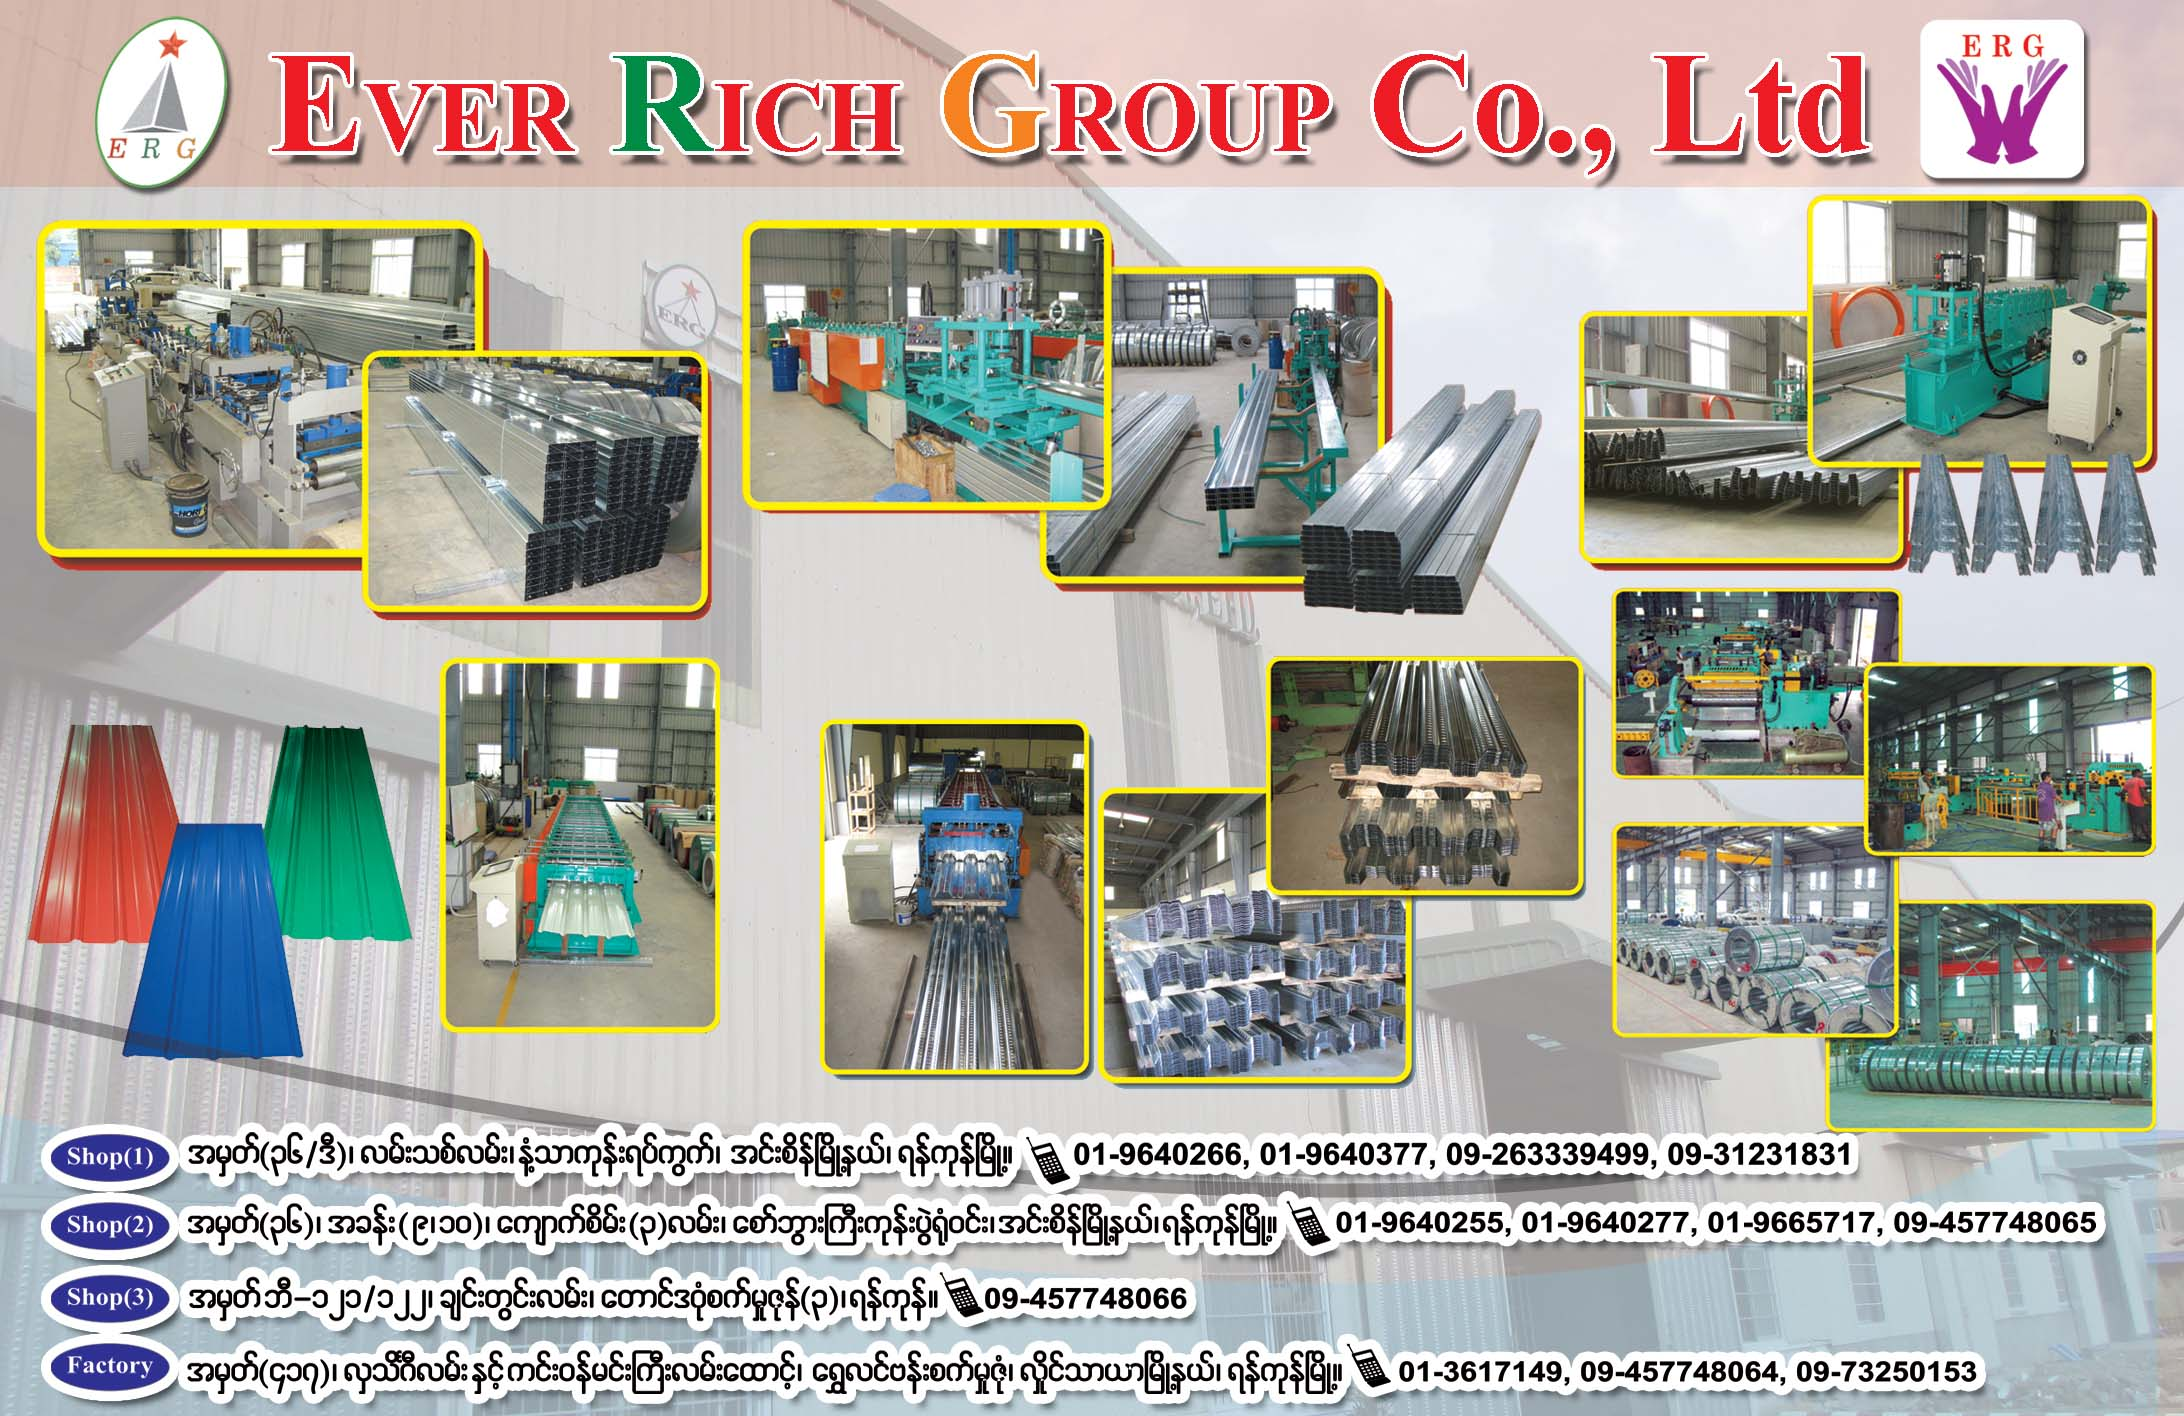 Ever Rich Group Co., Ltd.